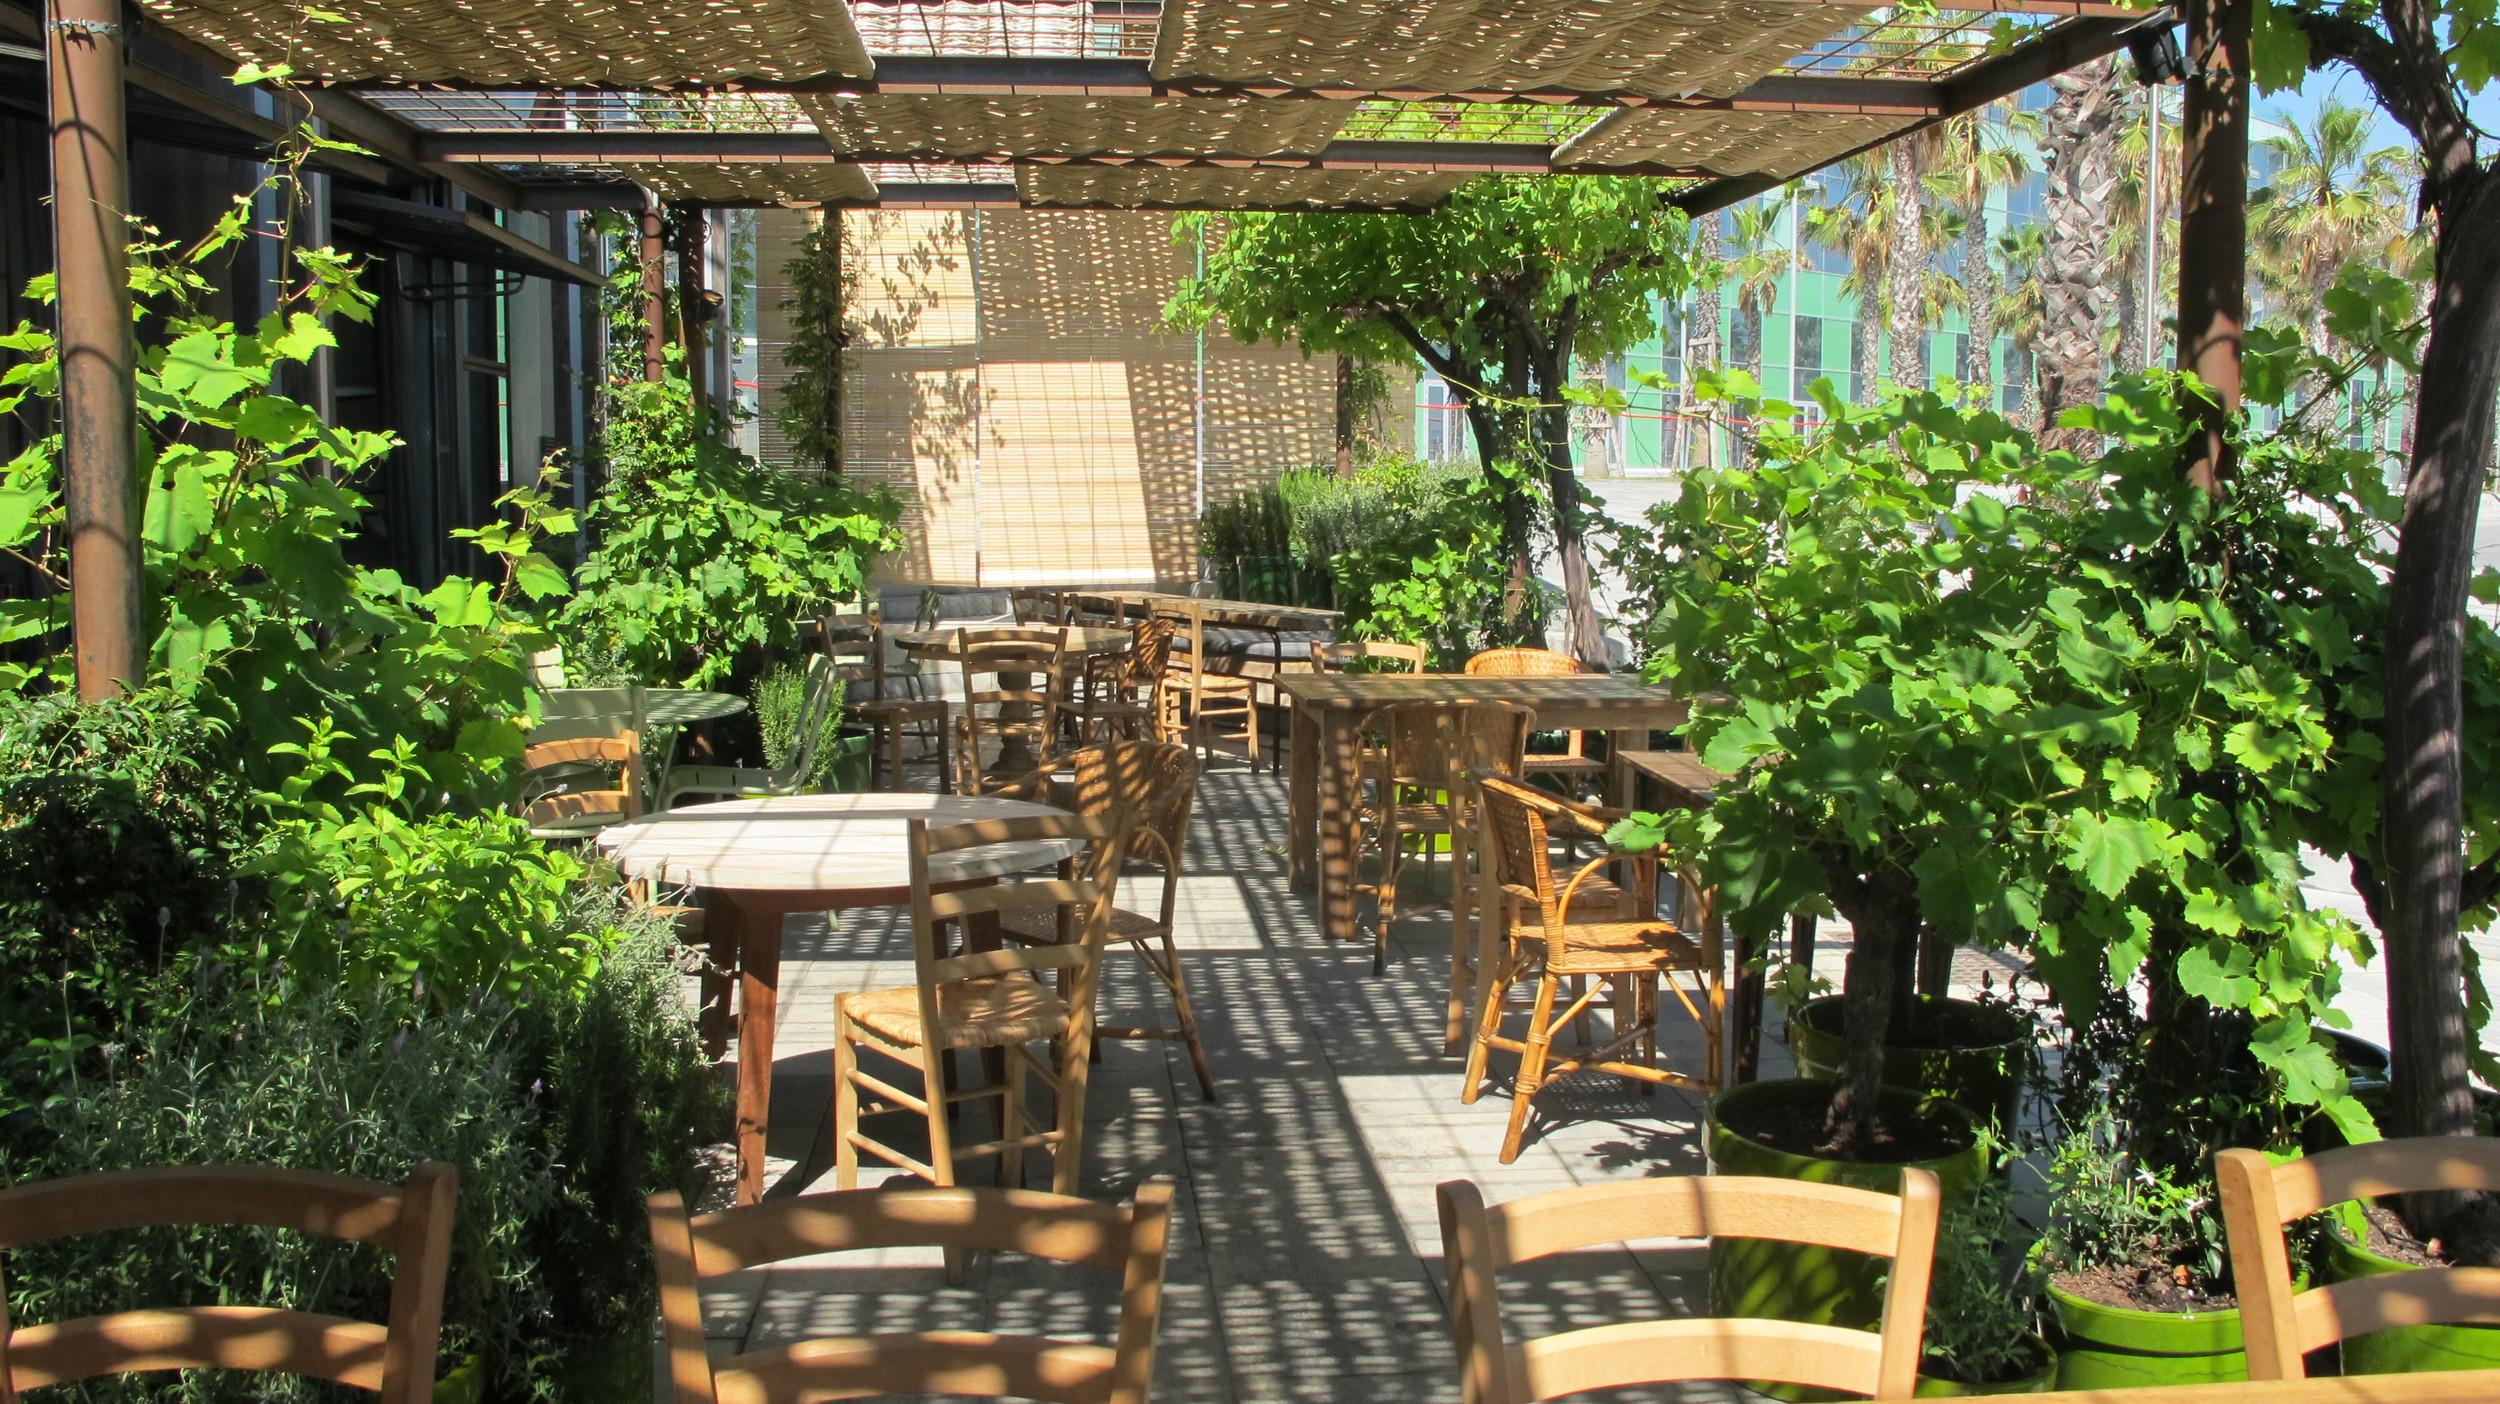 Aeland - Paisajismo - Landscape - Barcelona - Restaurant - Gallito - Grupo Tragaluz - Garden - Jardin